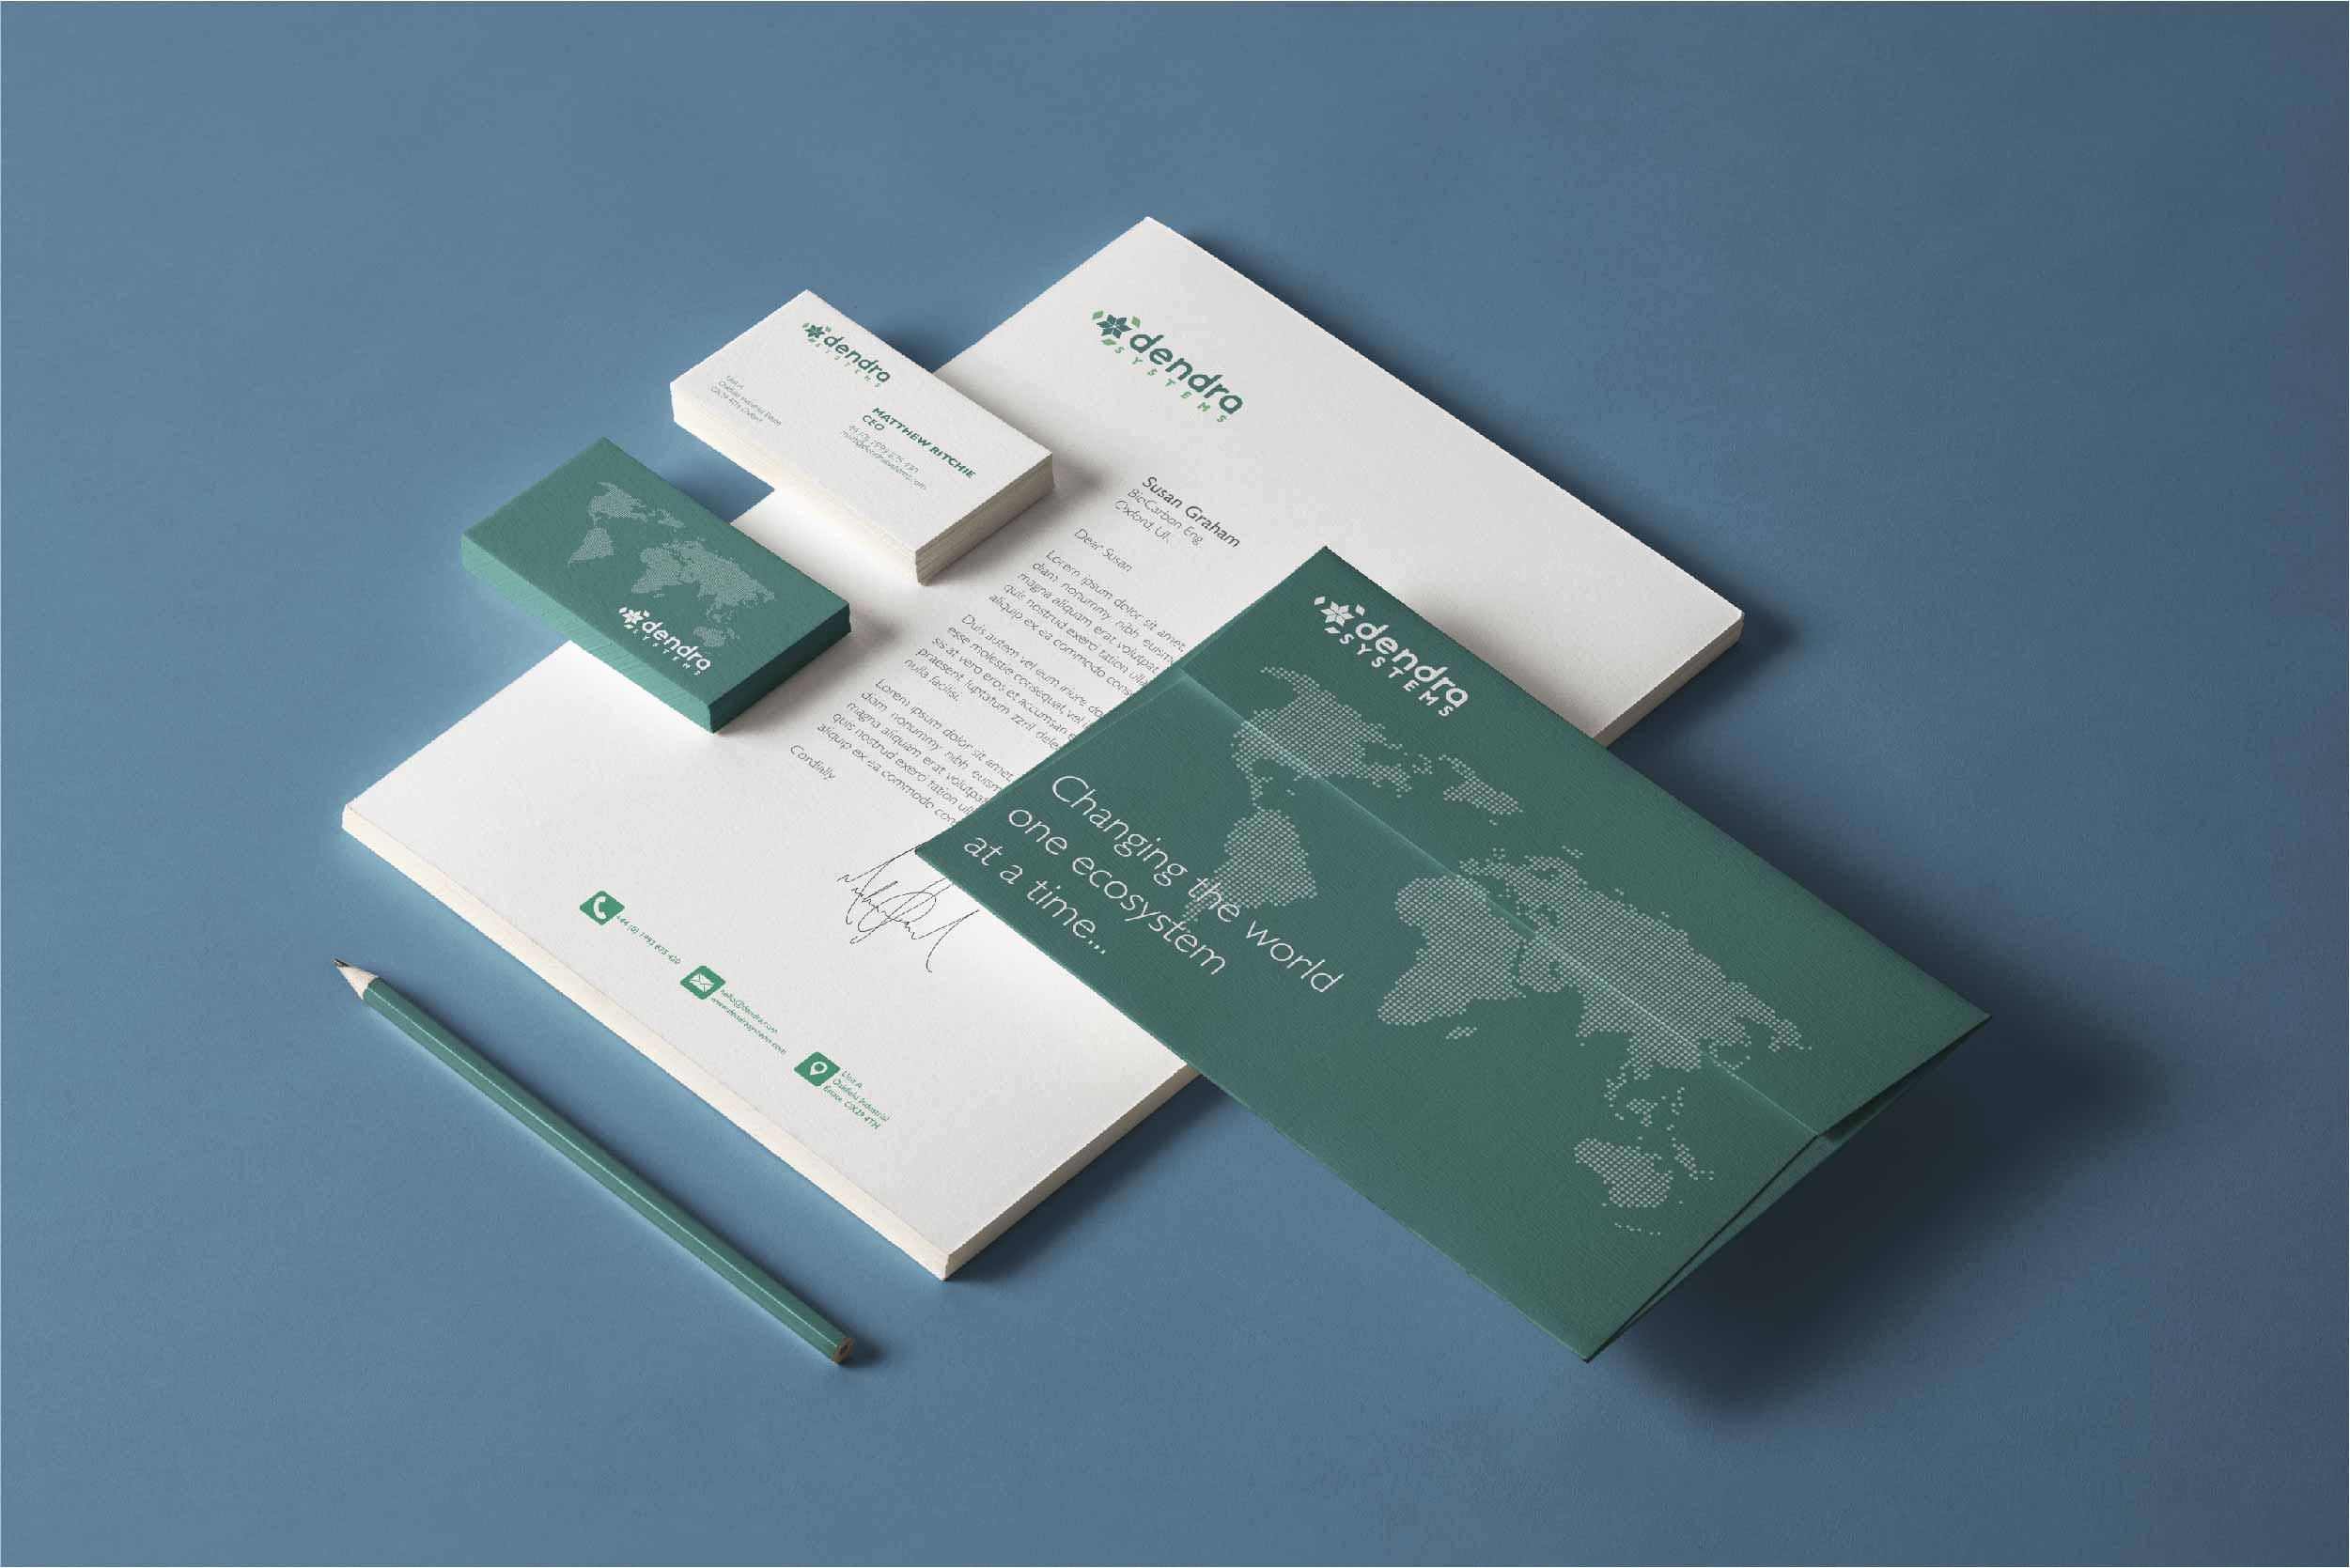 brand design on business stationery